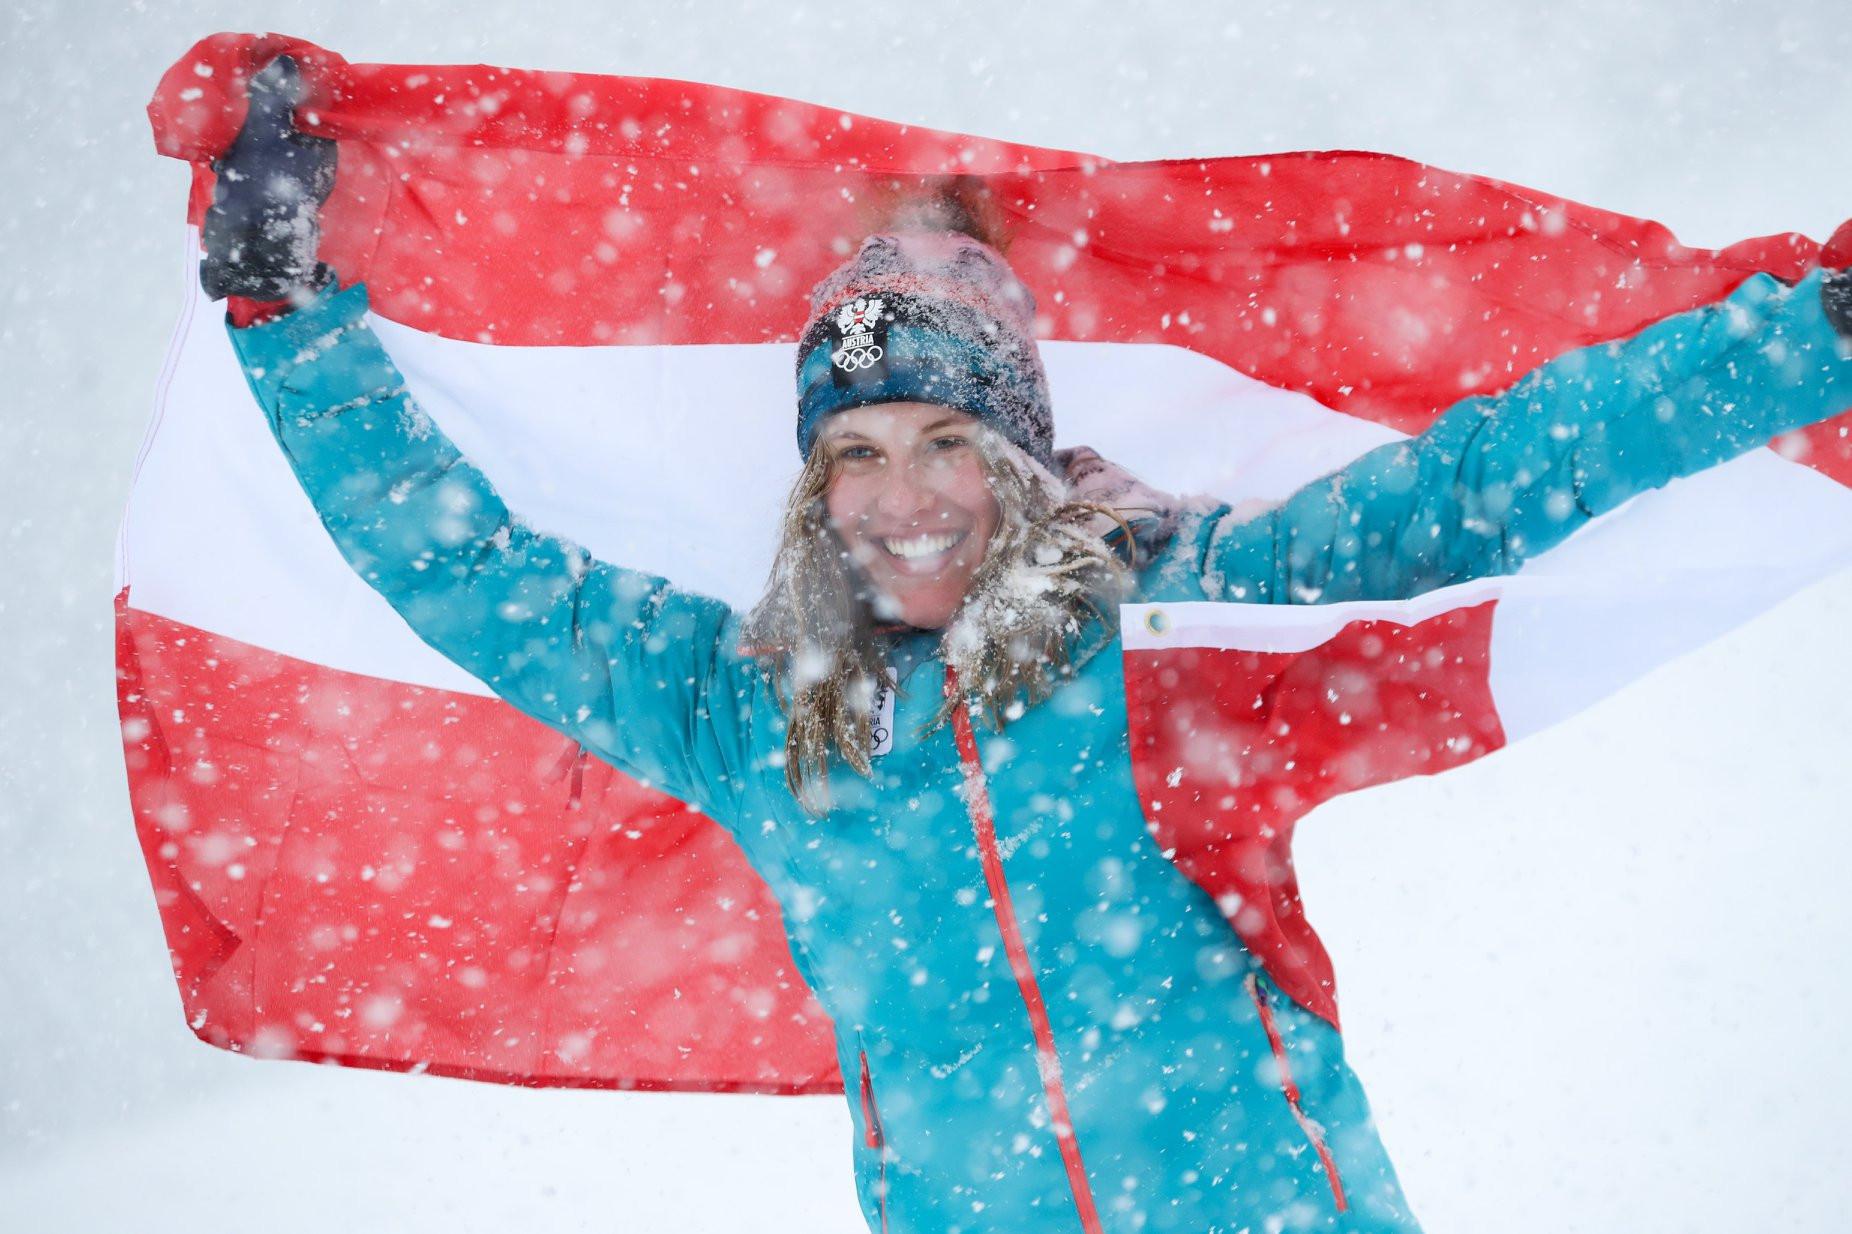 Egger continues domination of FIS Alpine Junior World Ski Championships